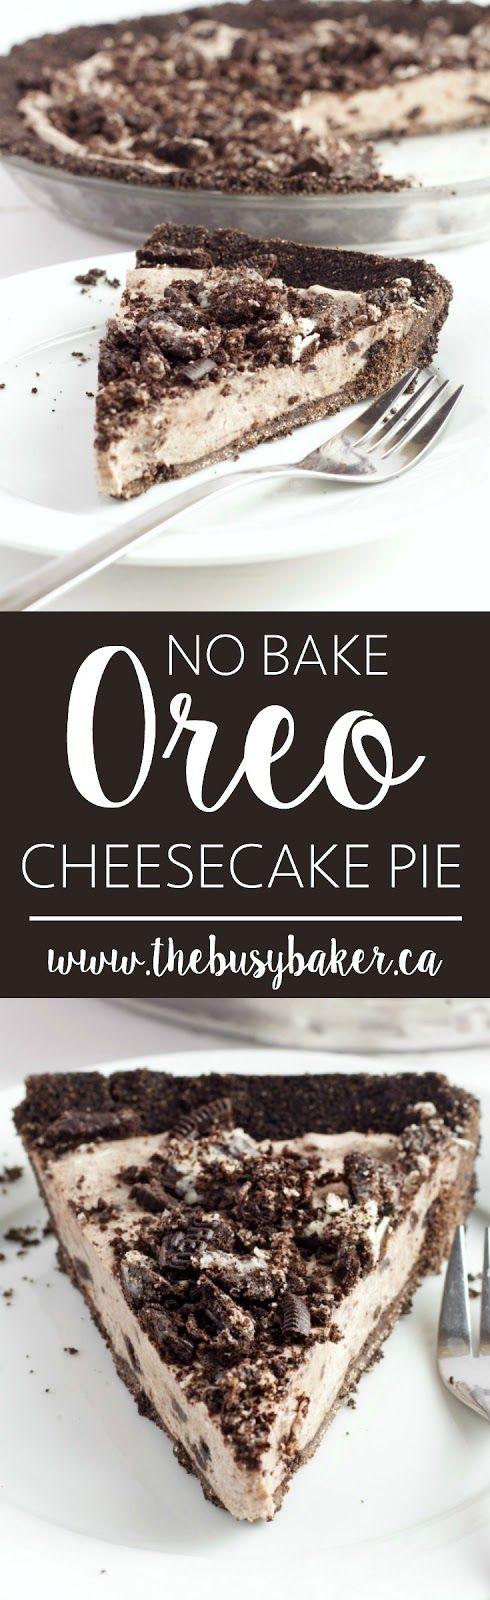 No Bake Oreo Cheesecake Pie www.thebusybaker.ca